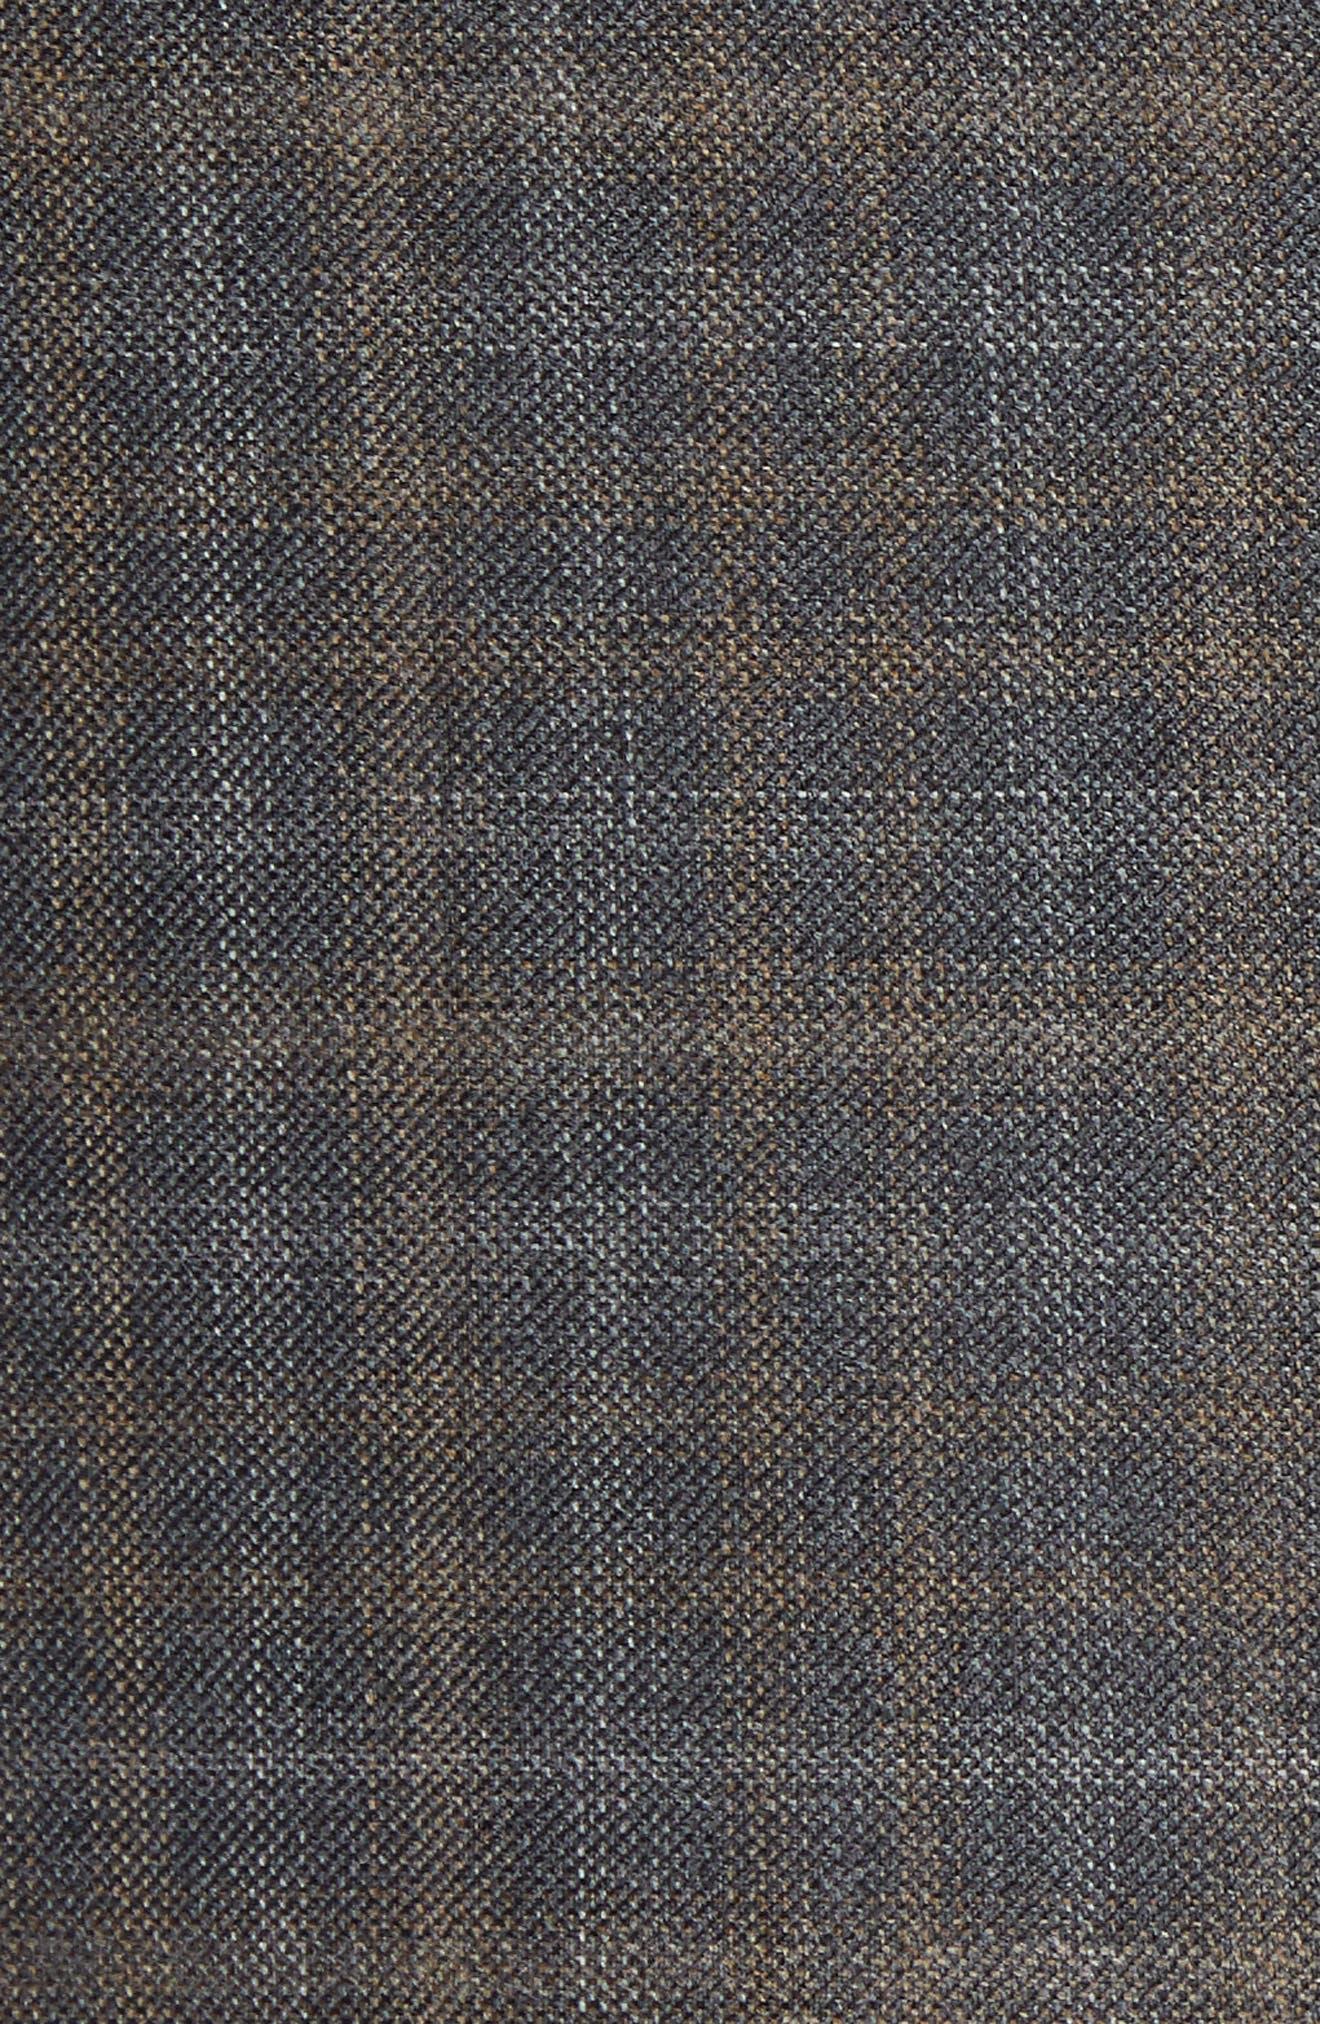 Classic Fit Wool Sport Coat,                             Alternate thumbnail 6, color,                             BROWN